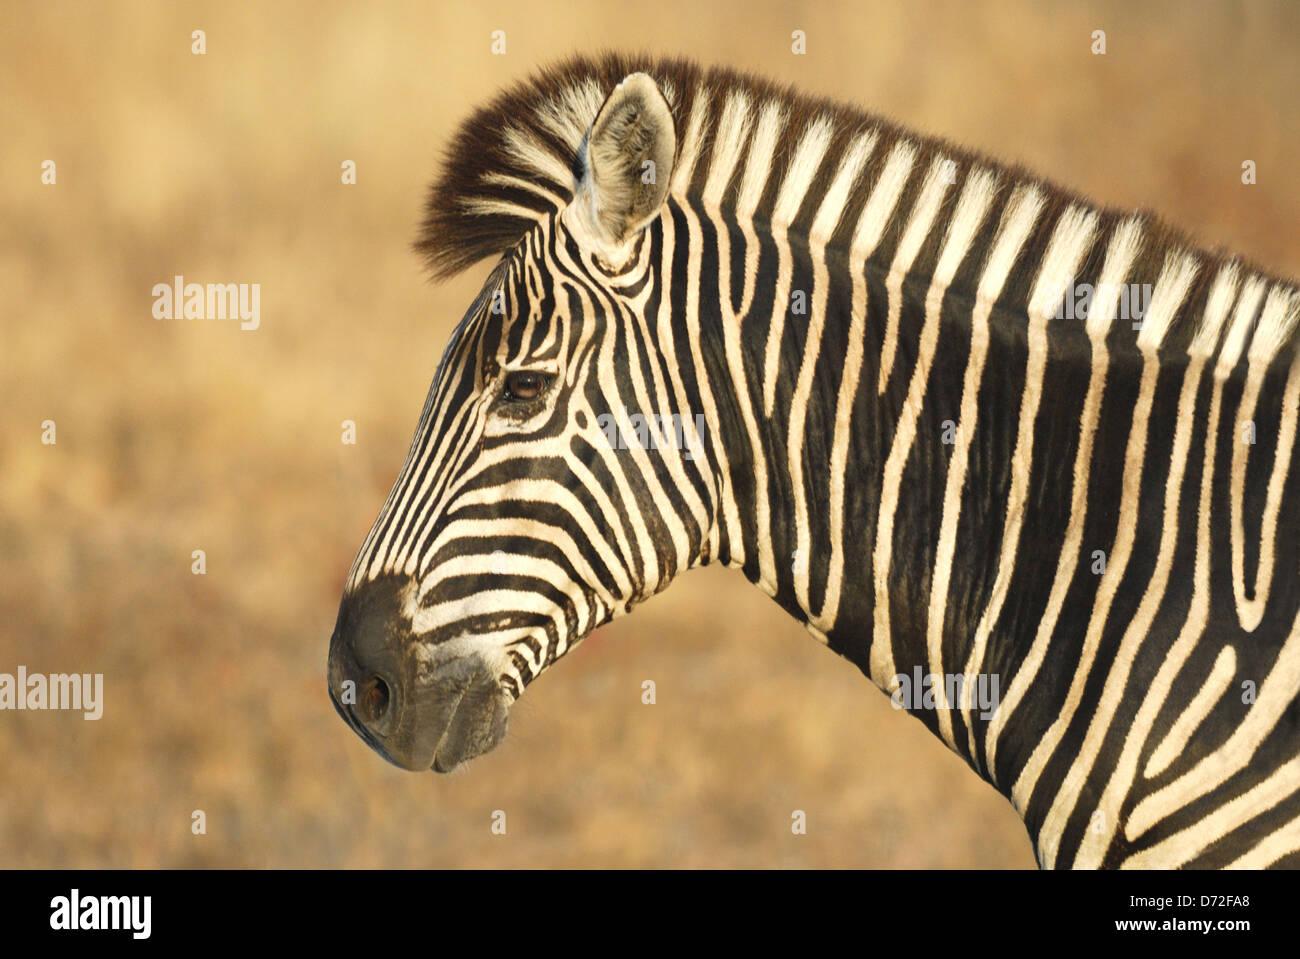 Maschio del Burchell Zebra (Equus burchellii) nel Parco Nazionale di Kruger, Sud Africa Immagini Stock